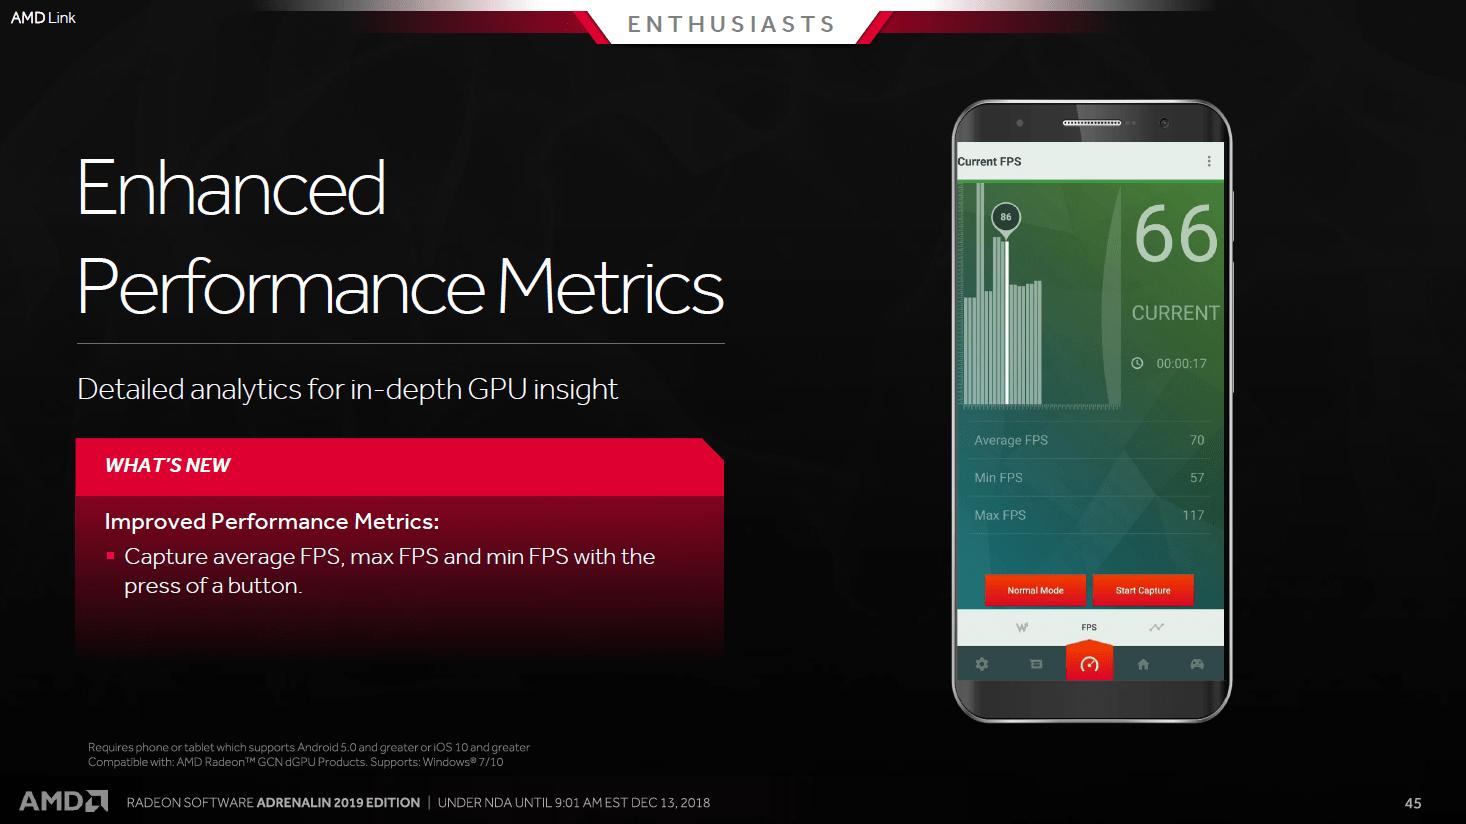 AMD Link App